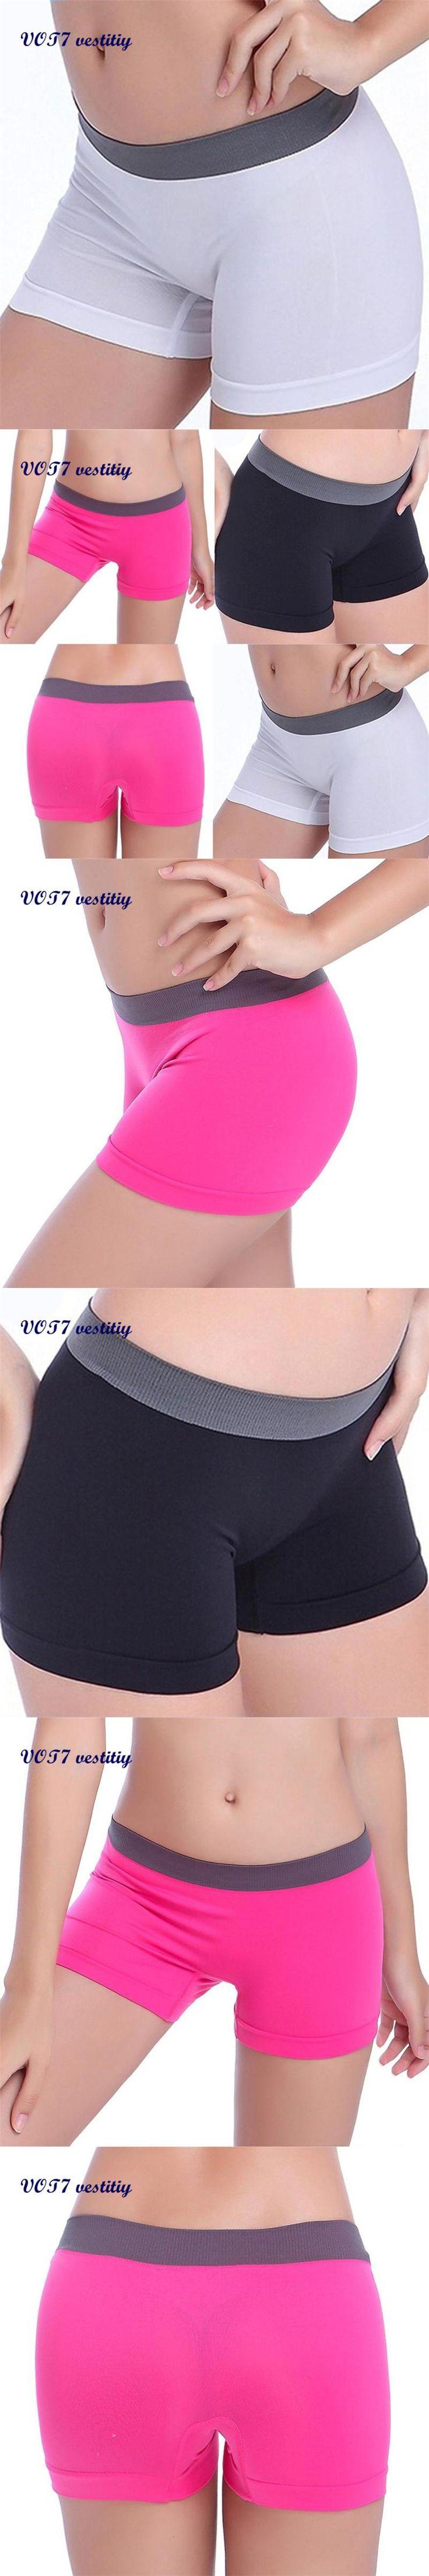 VOT7 vestitiy 2017 fashion lady shorts Women Workout Waistband Skinny Shorts trousers Sep 8